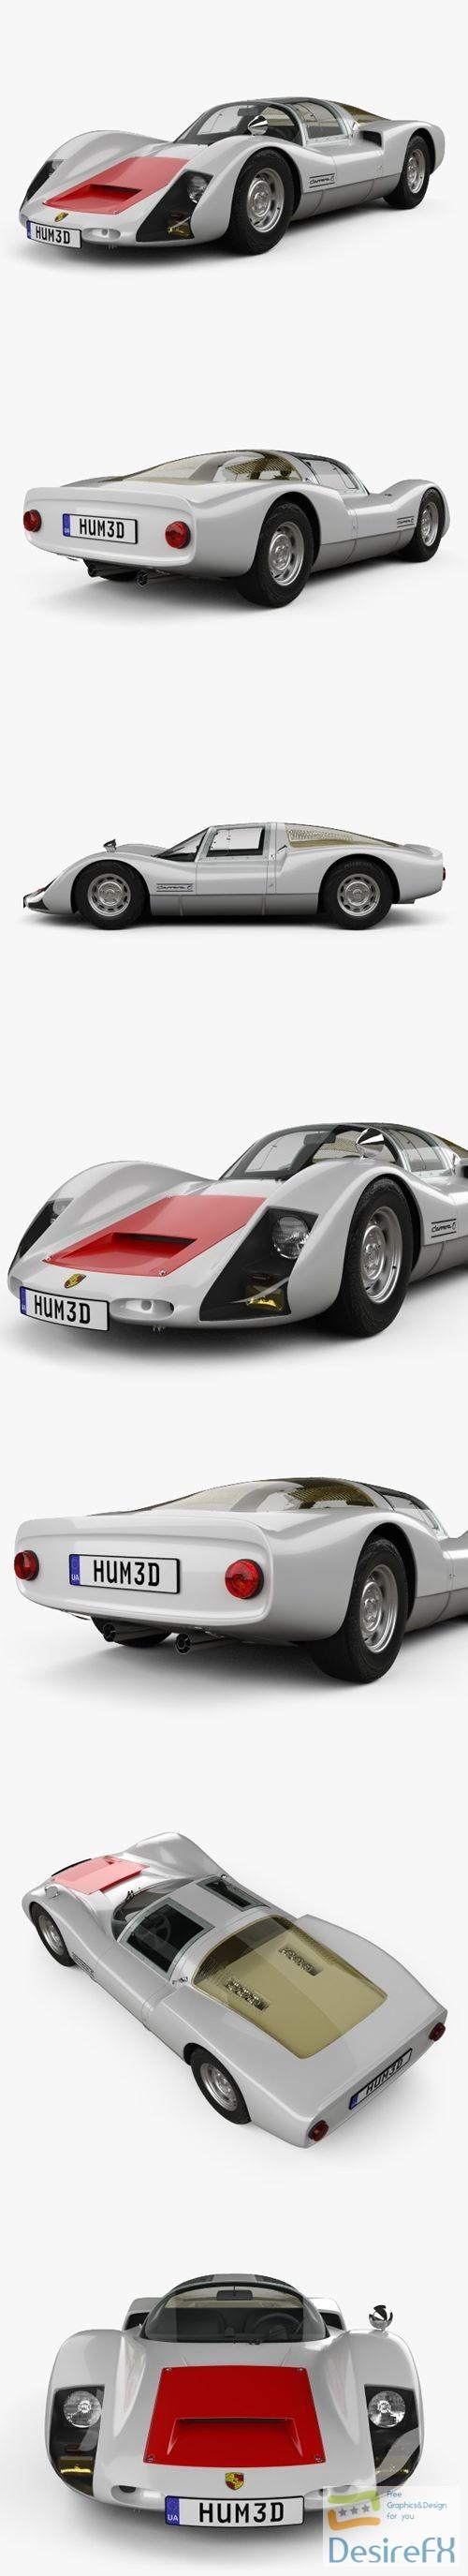 Porsche 906 Carrera 6 Coupe 1966 3D Model